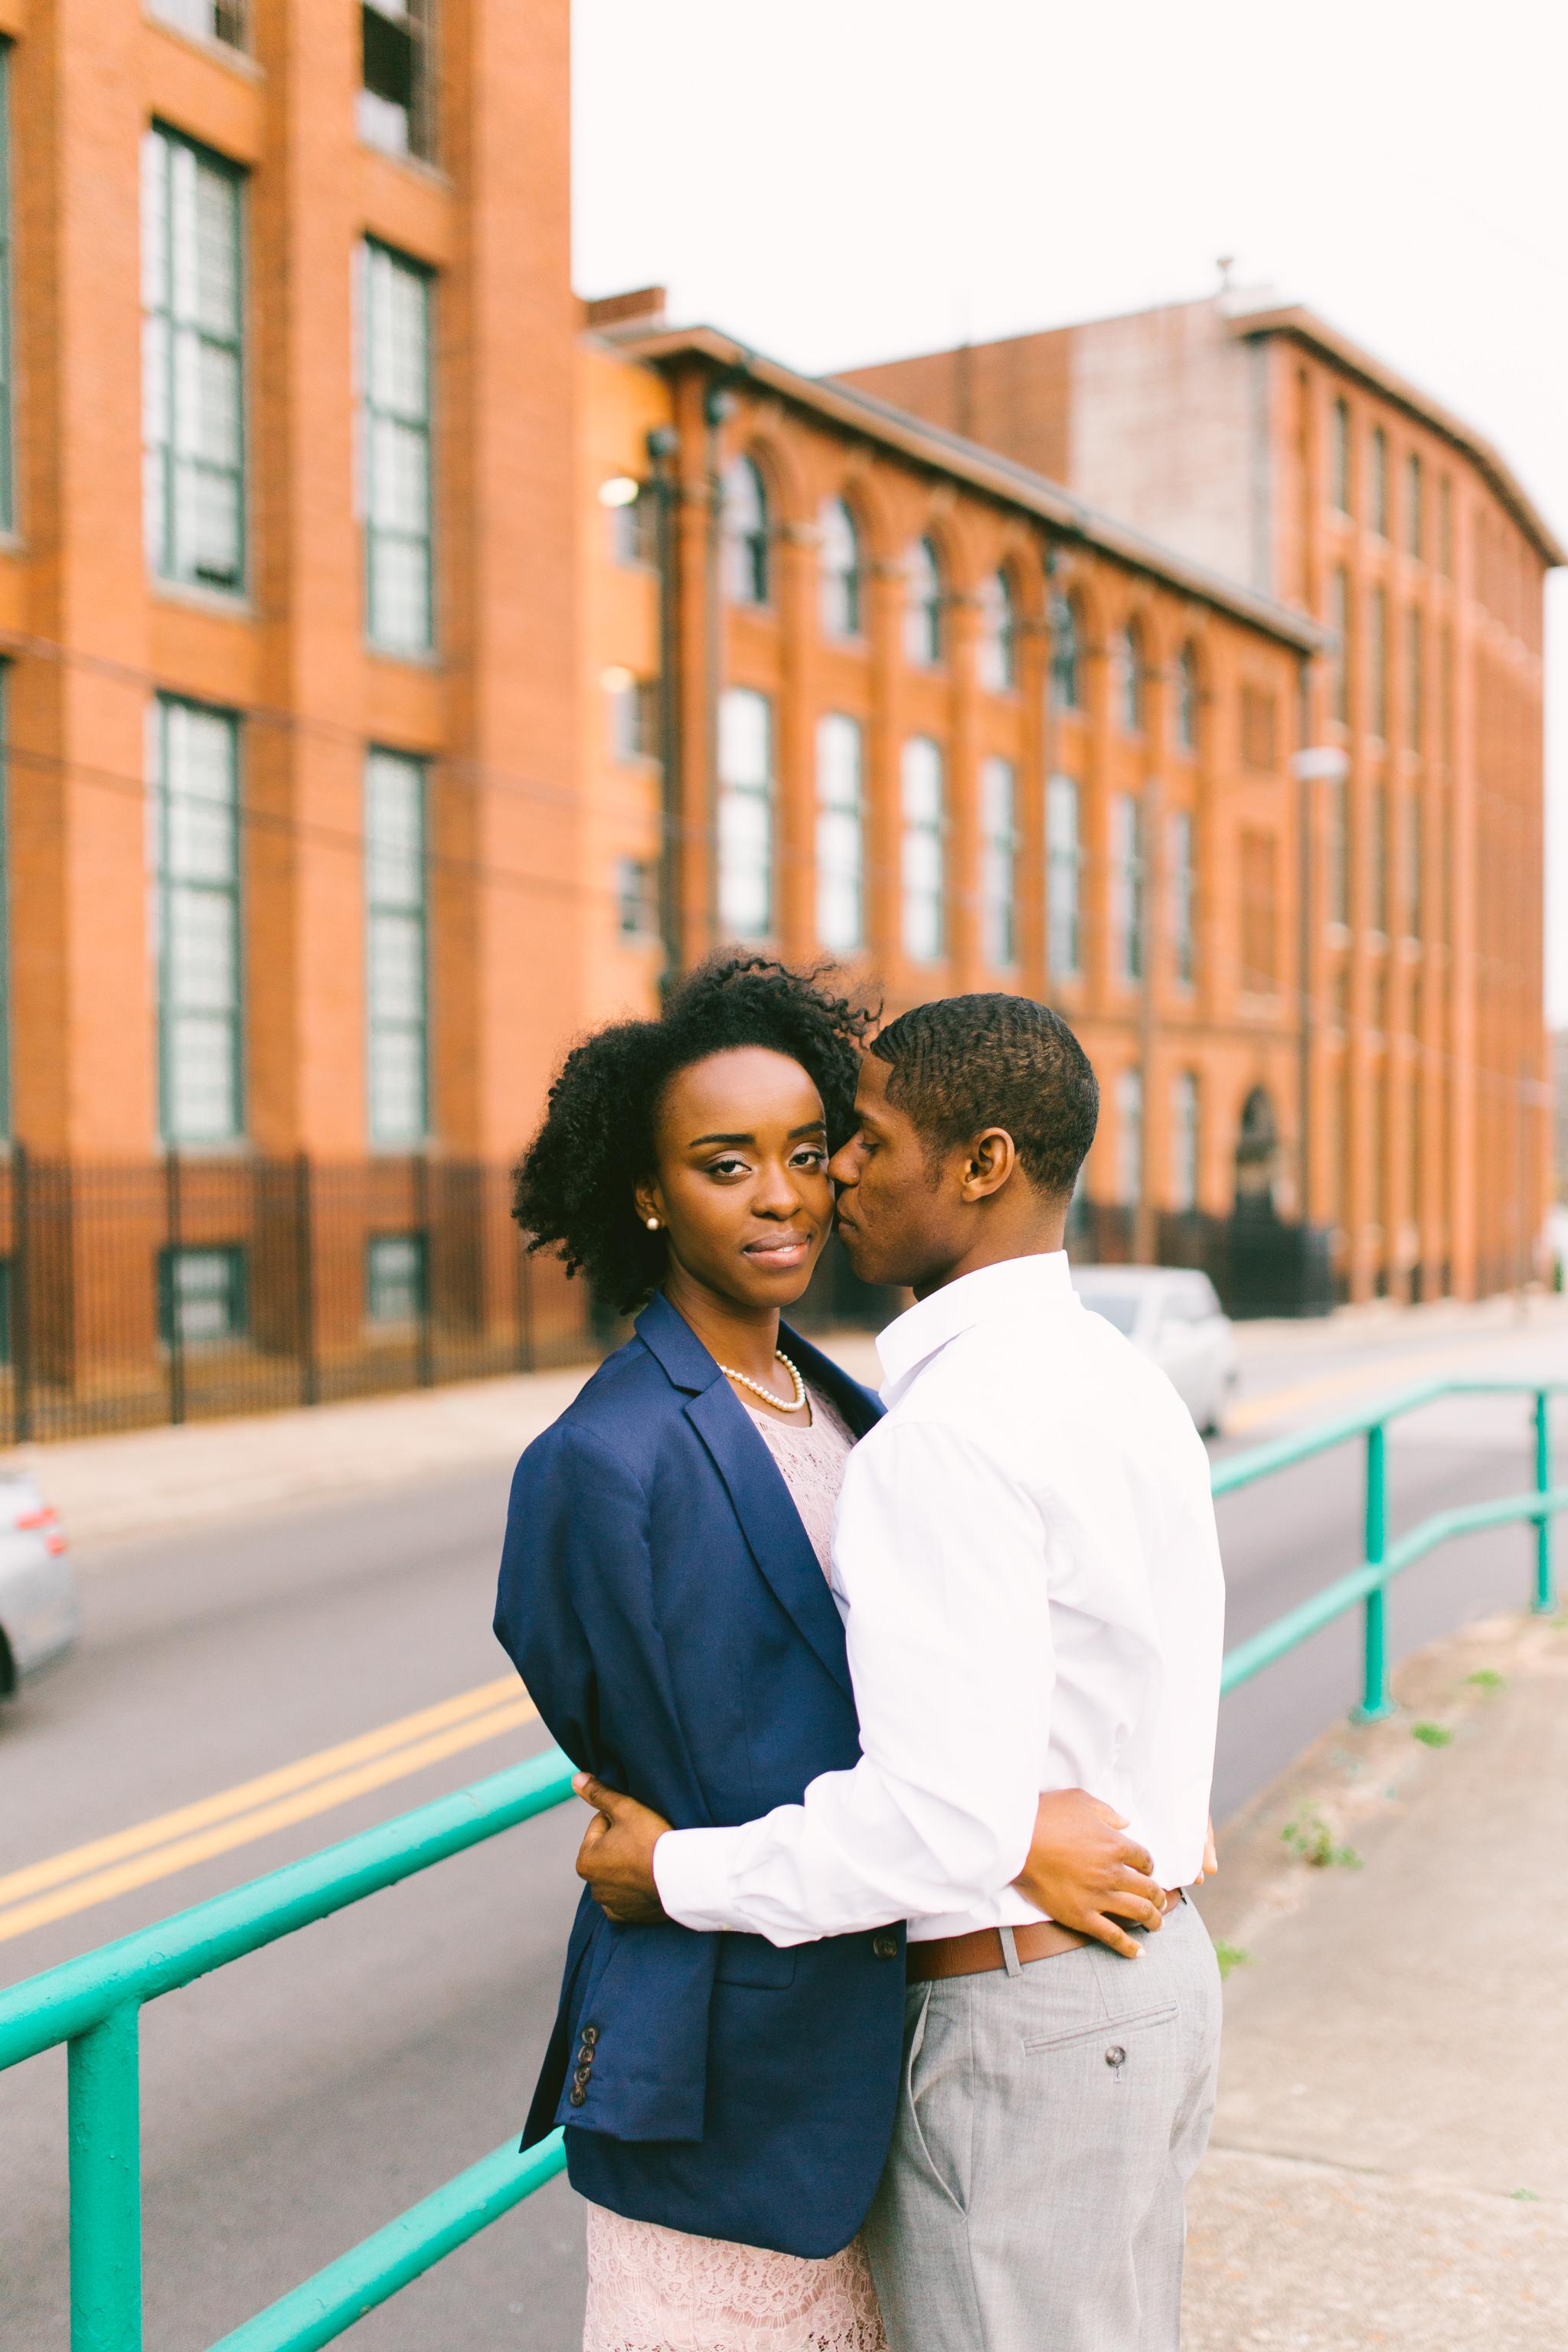 Grant-Park-Atlanta-Engagement-Pictures-Kiyah-C-Photography-14.jpg